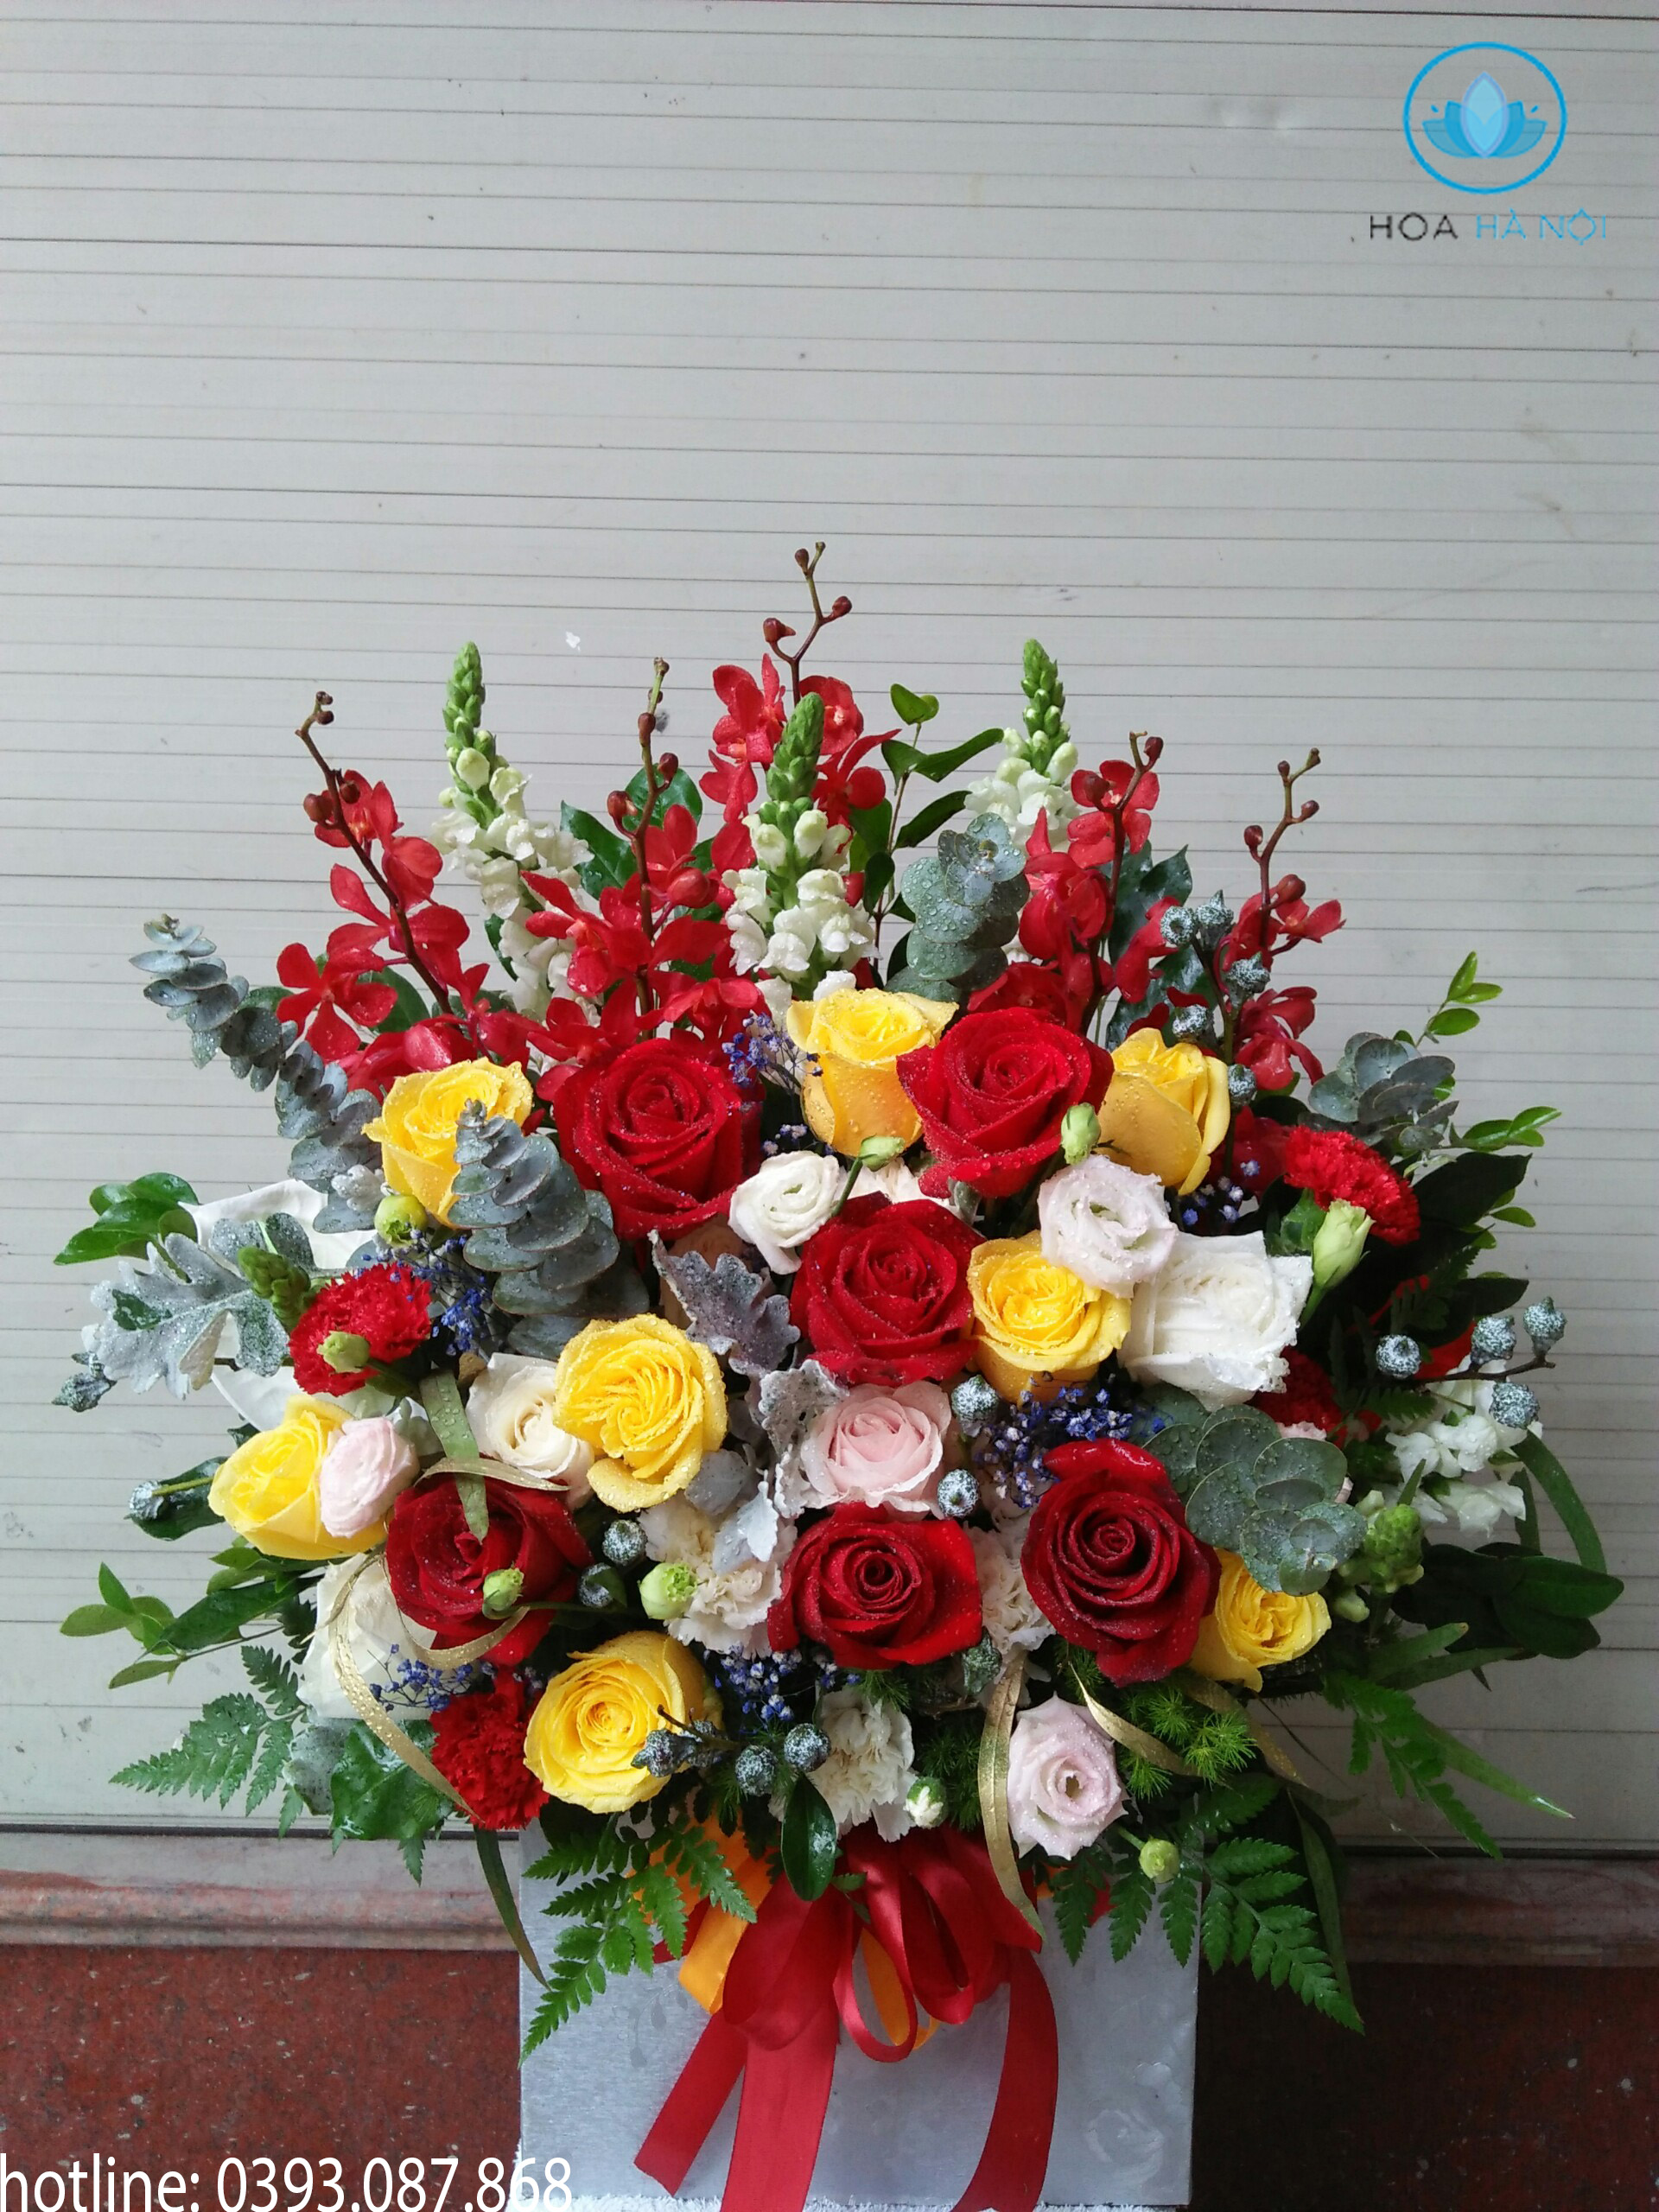 Một số mẫu hoa mới tạiNga's Flowers 1